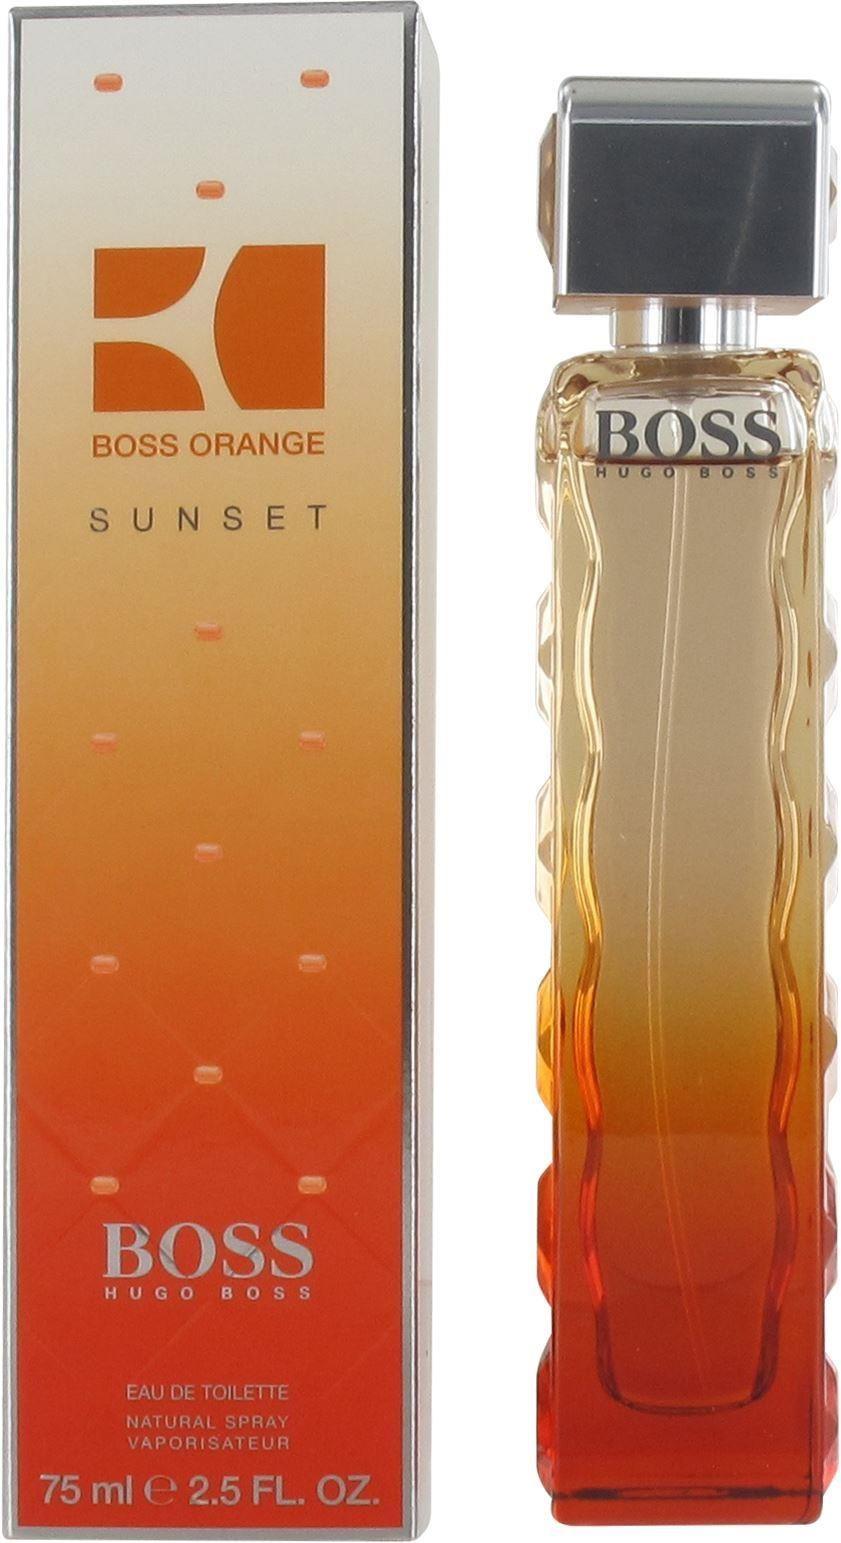 Hugo Boss Boss Orange Sunset 75ml Eau De Toilette Spray